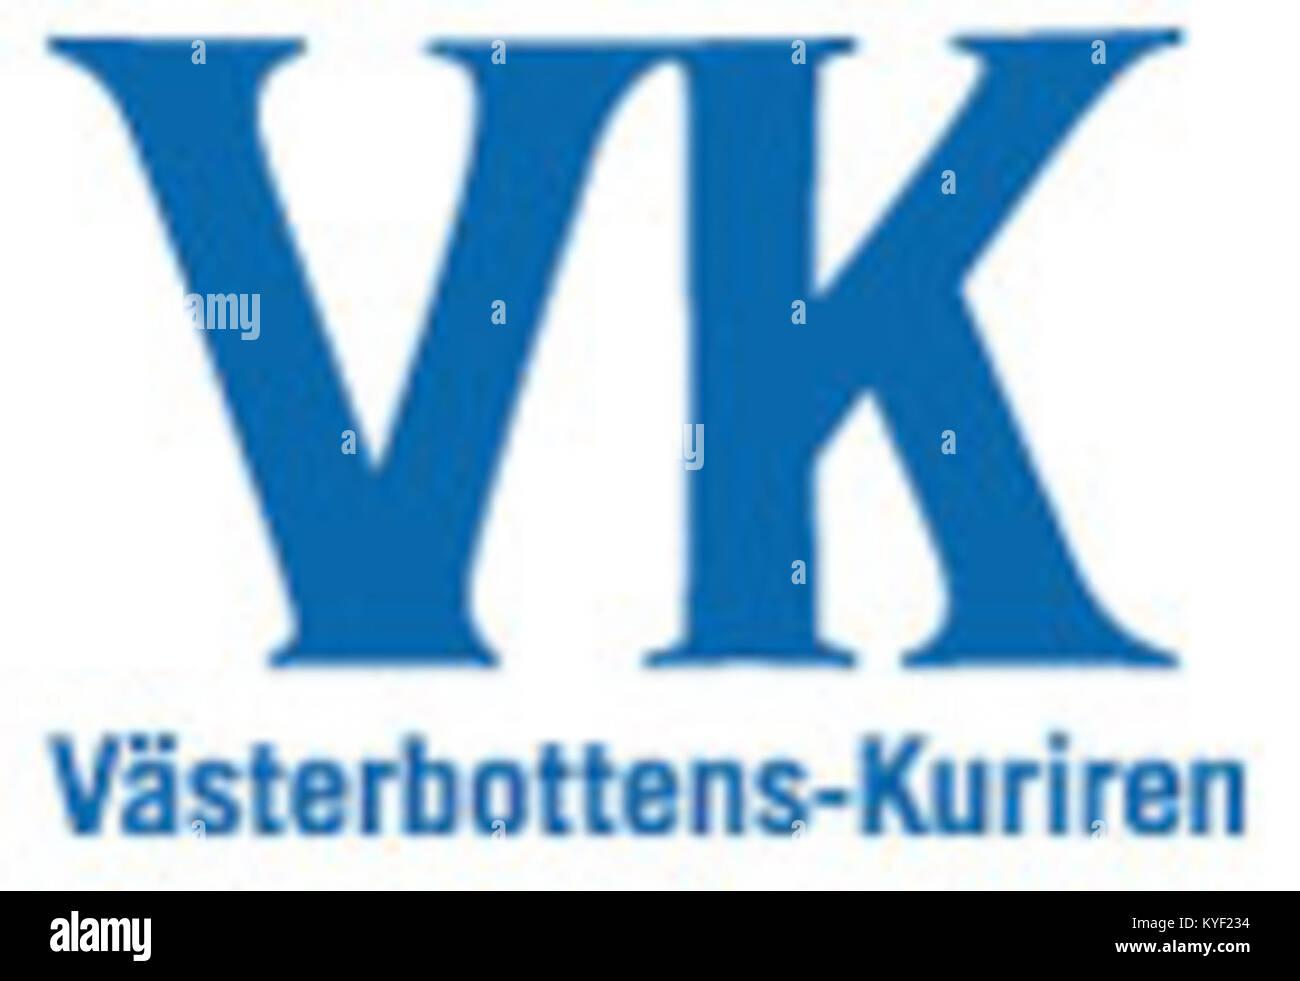 Vasterbottens Kuriren Logo